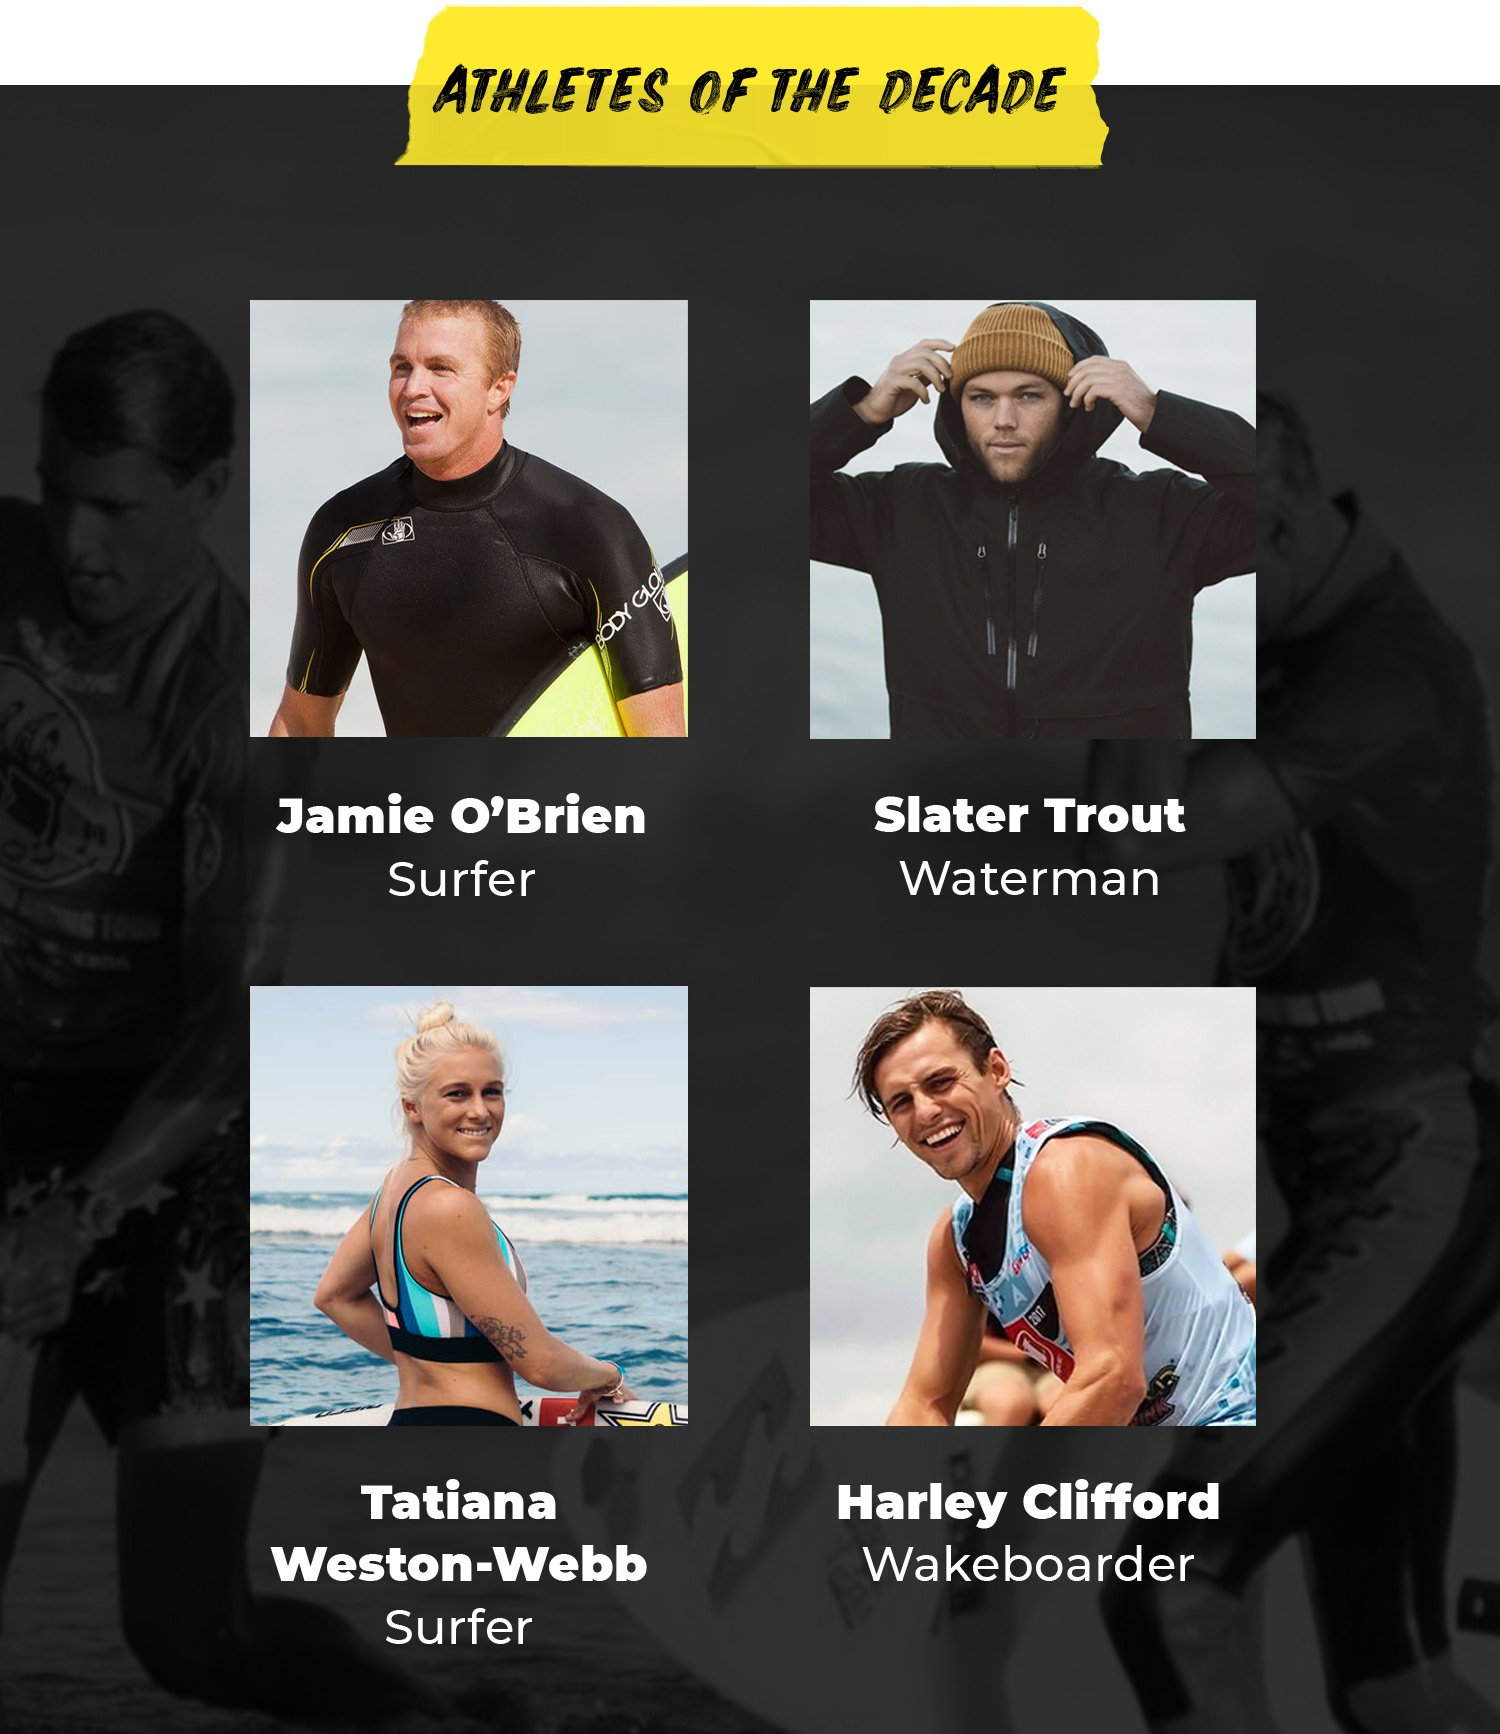 Athletes of the Decade | Jamie O'Brien, Surfer | Slater Trout, Waterman | Tatiana Weston-Webb, Surfer | Harley Clifford, Wakeboarder